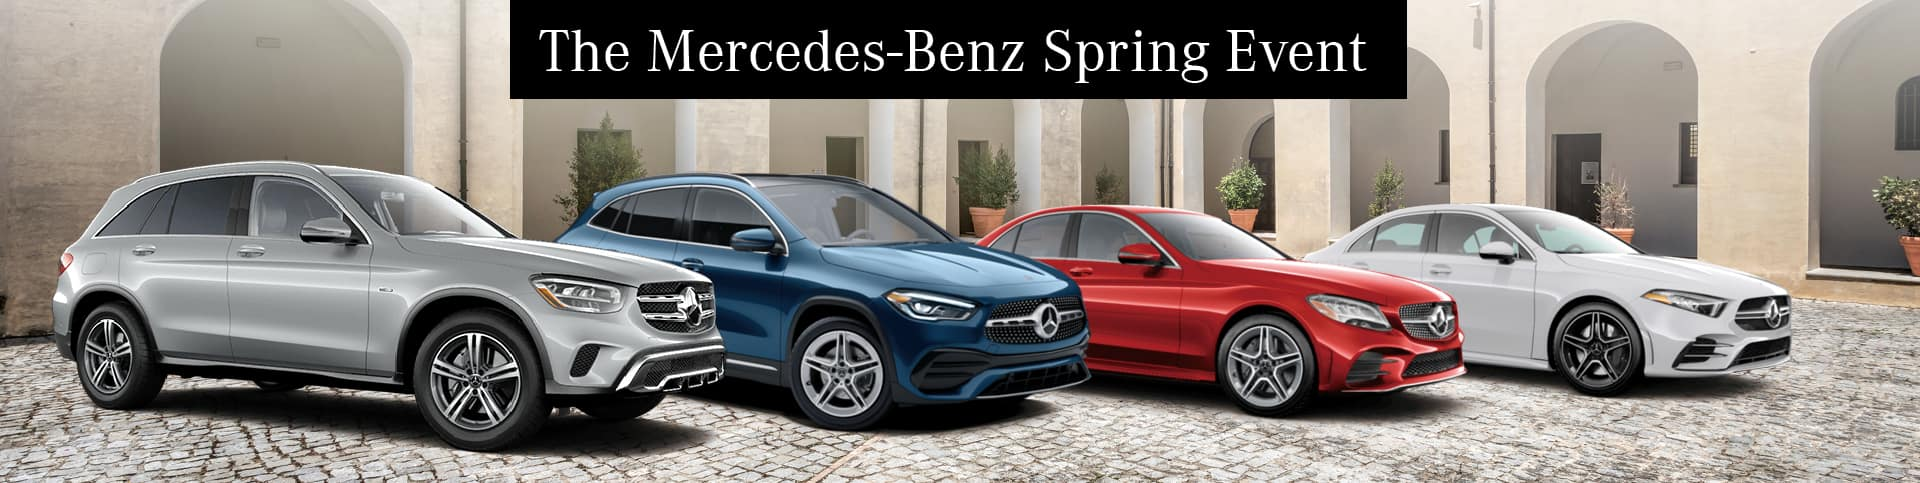 Mercedes-Benz Multicar Image